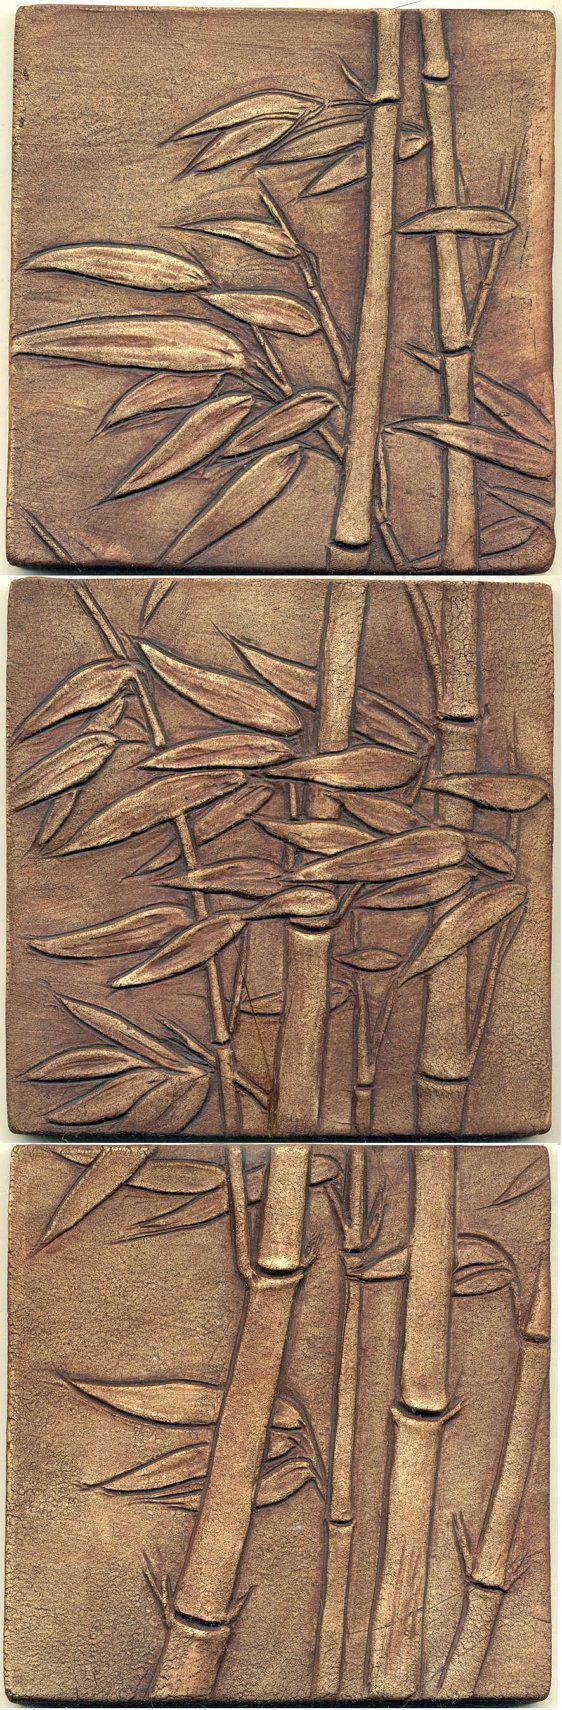 "Asian style Windblown Bamboo Tiles   Set of 3 Tiles  18"" x 6"""